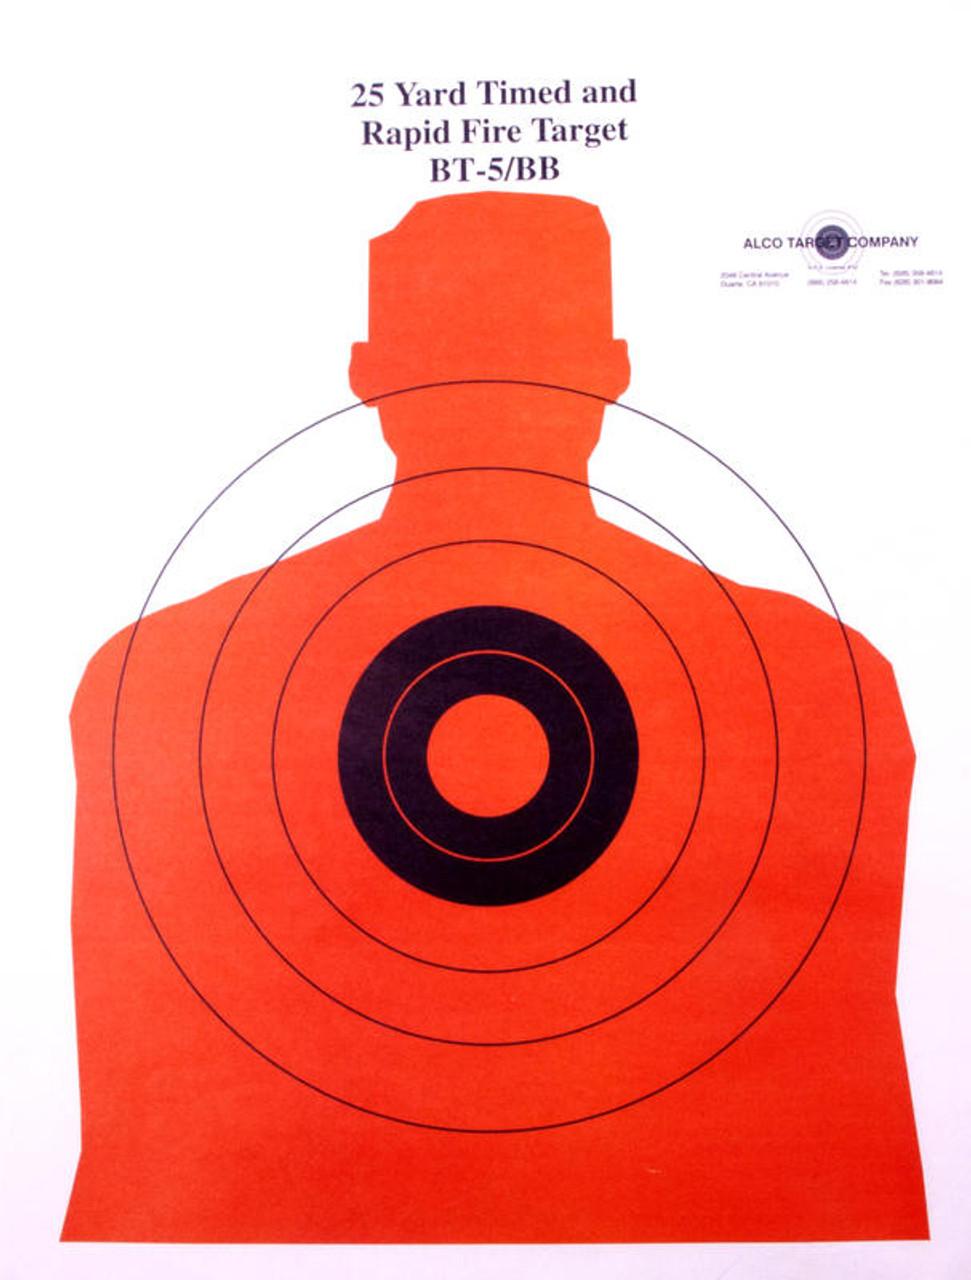 BT-5 BB Shooting Target